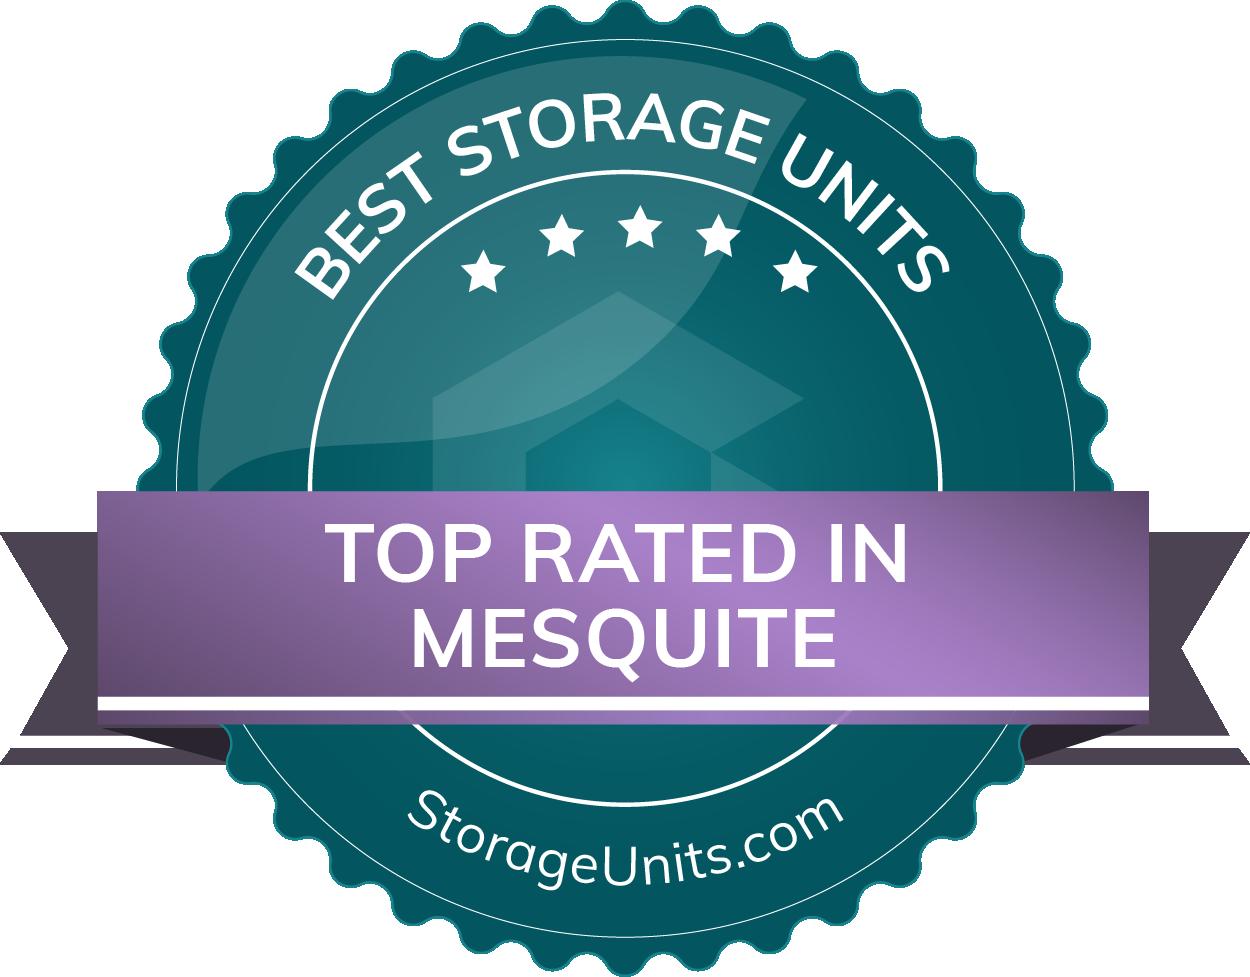 Best Self Storage Units in Mesquite, TX